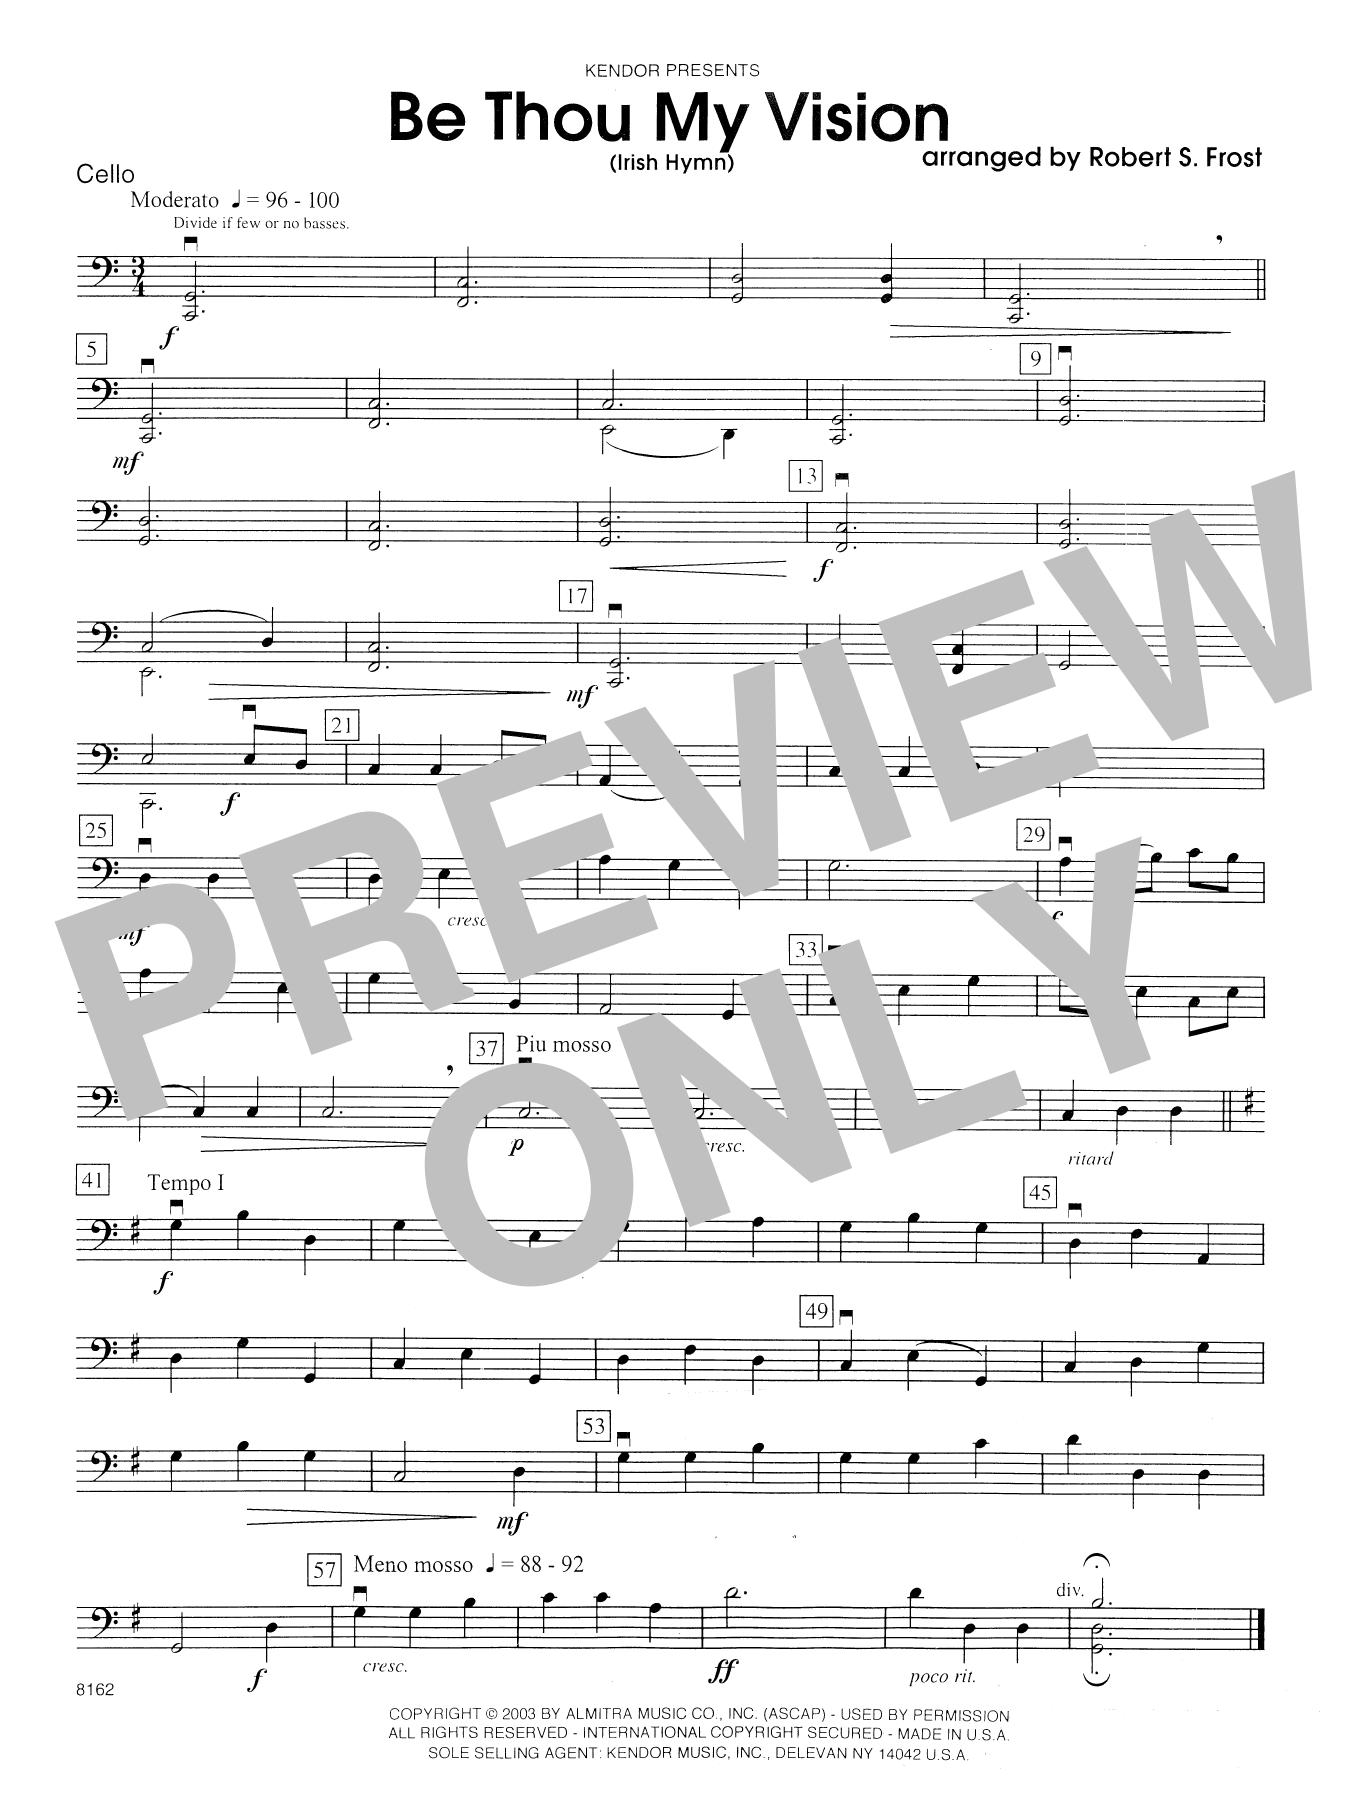 Be Thou My Vision (Irish Hymn) - Cello Sheet Music